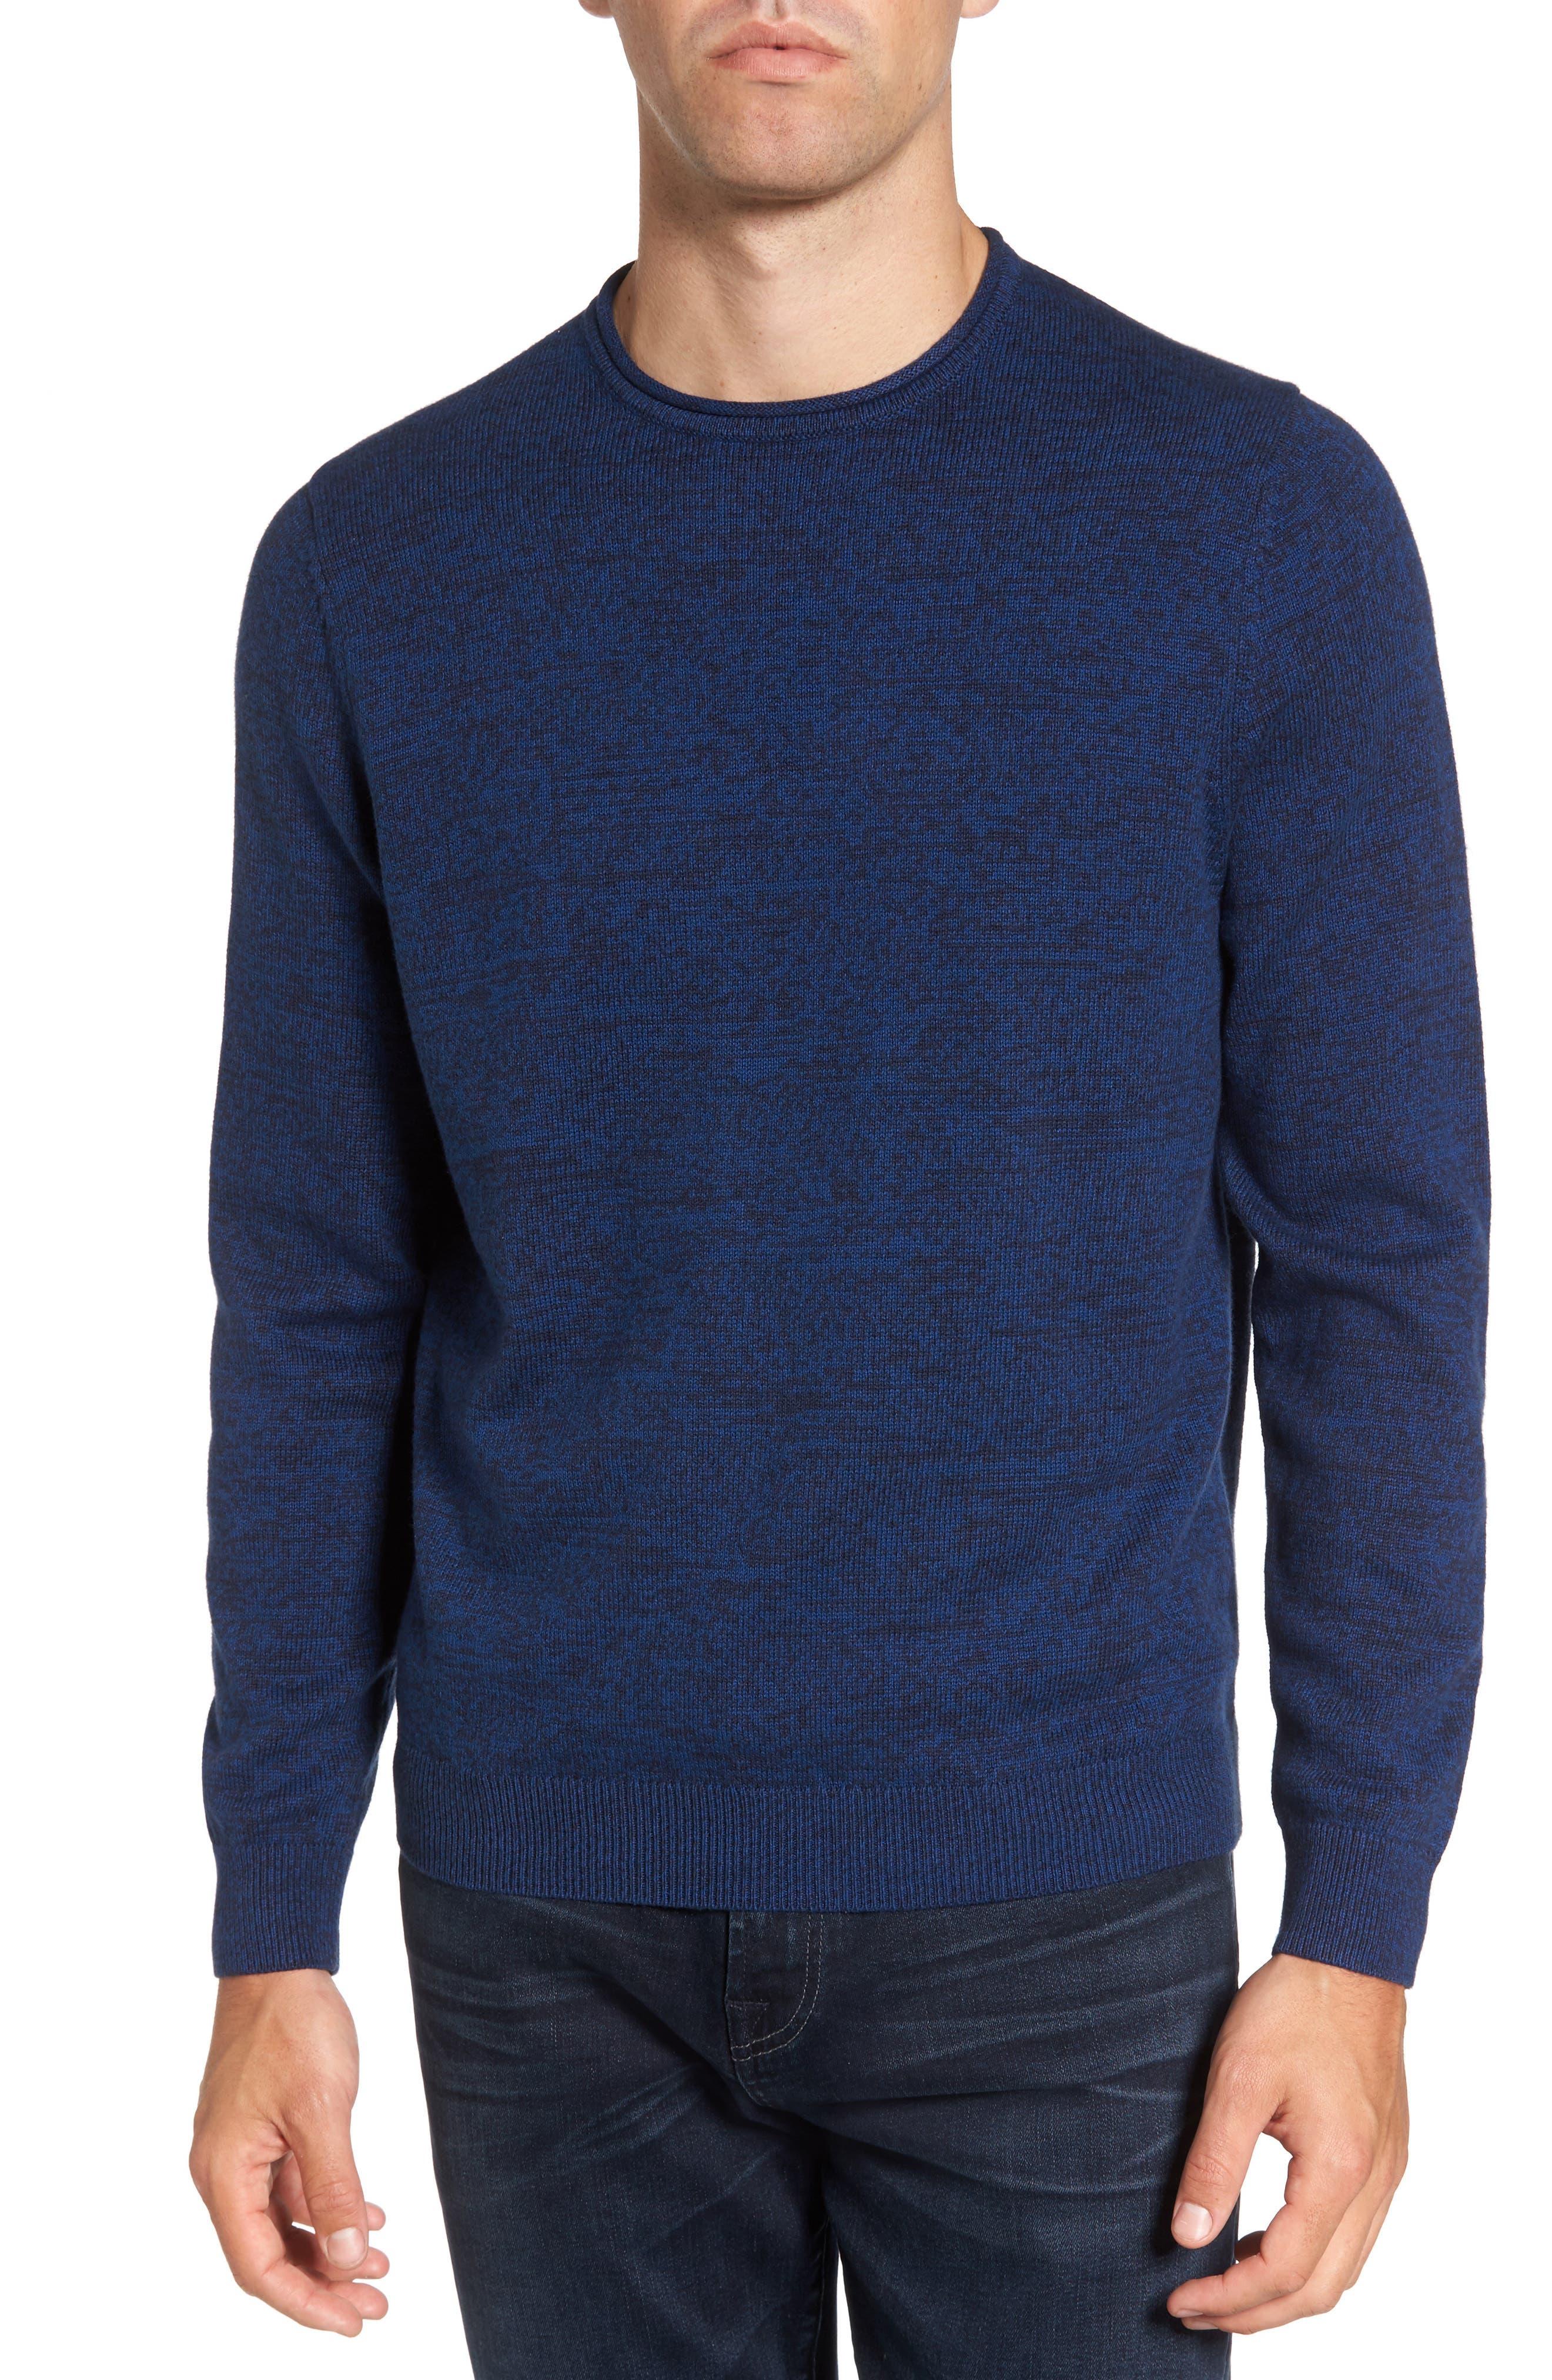 Main Image - Nordstrom Men's Shop Cotton & Cashmere Roll Neck Sweater